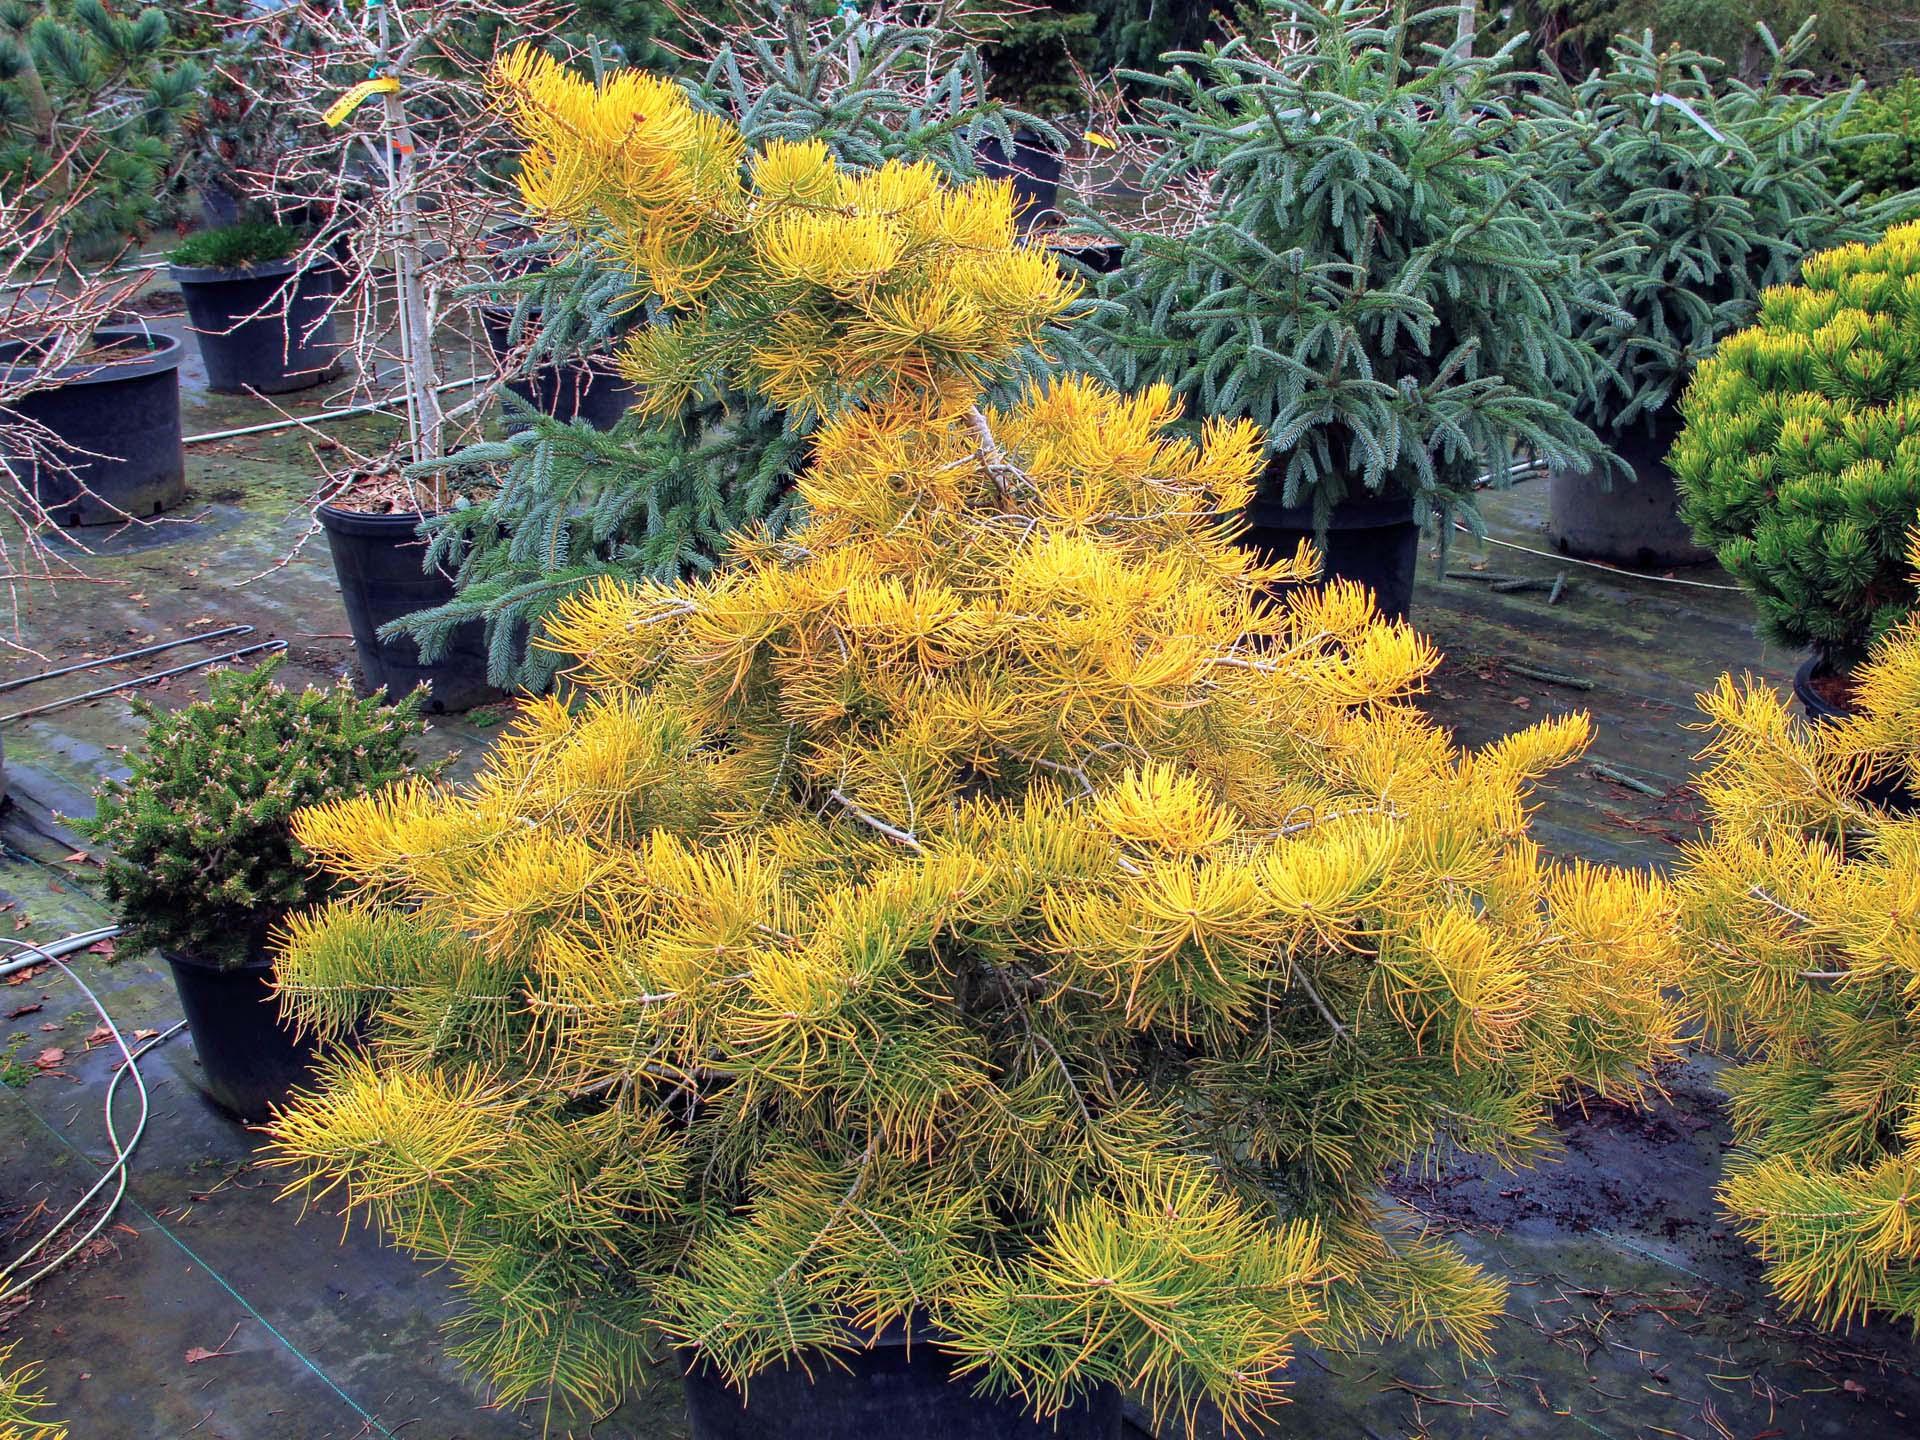 Abies concolor 'Wintergold'